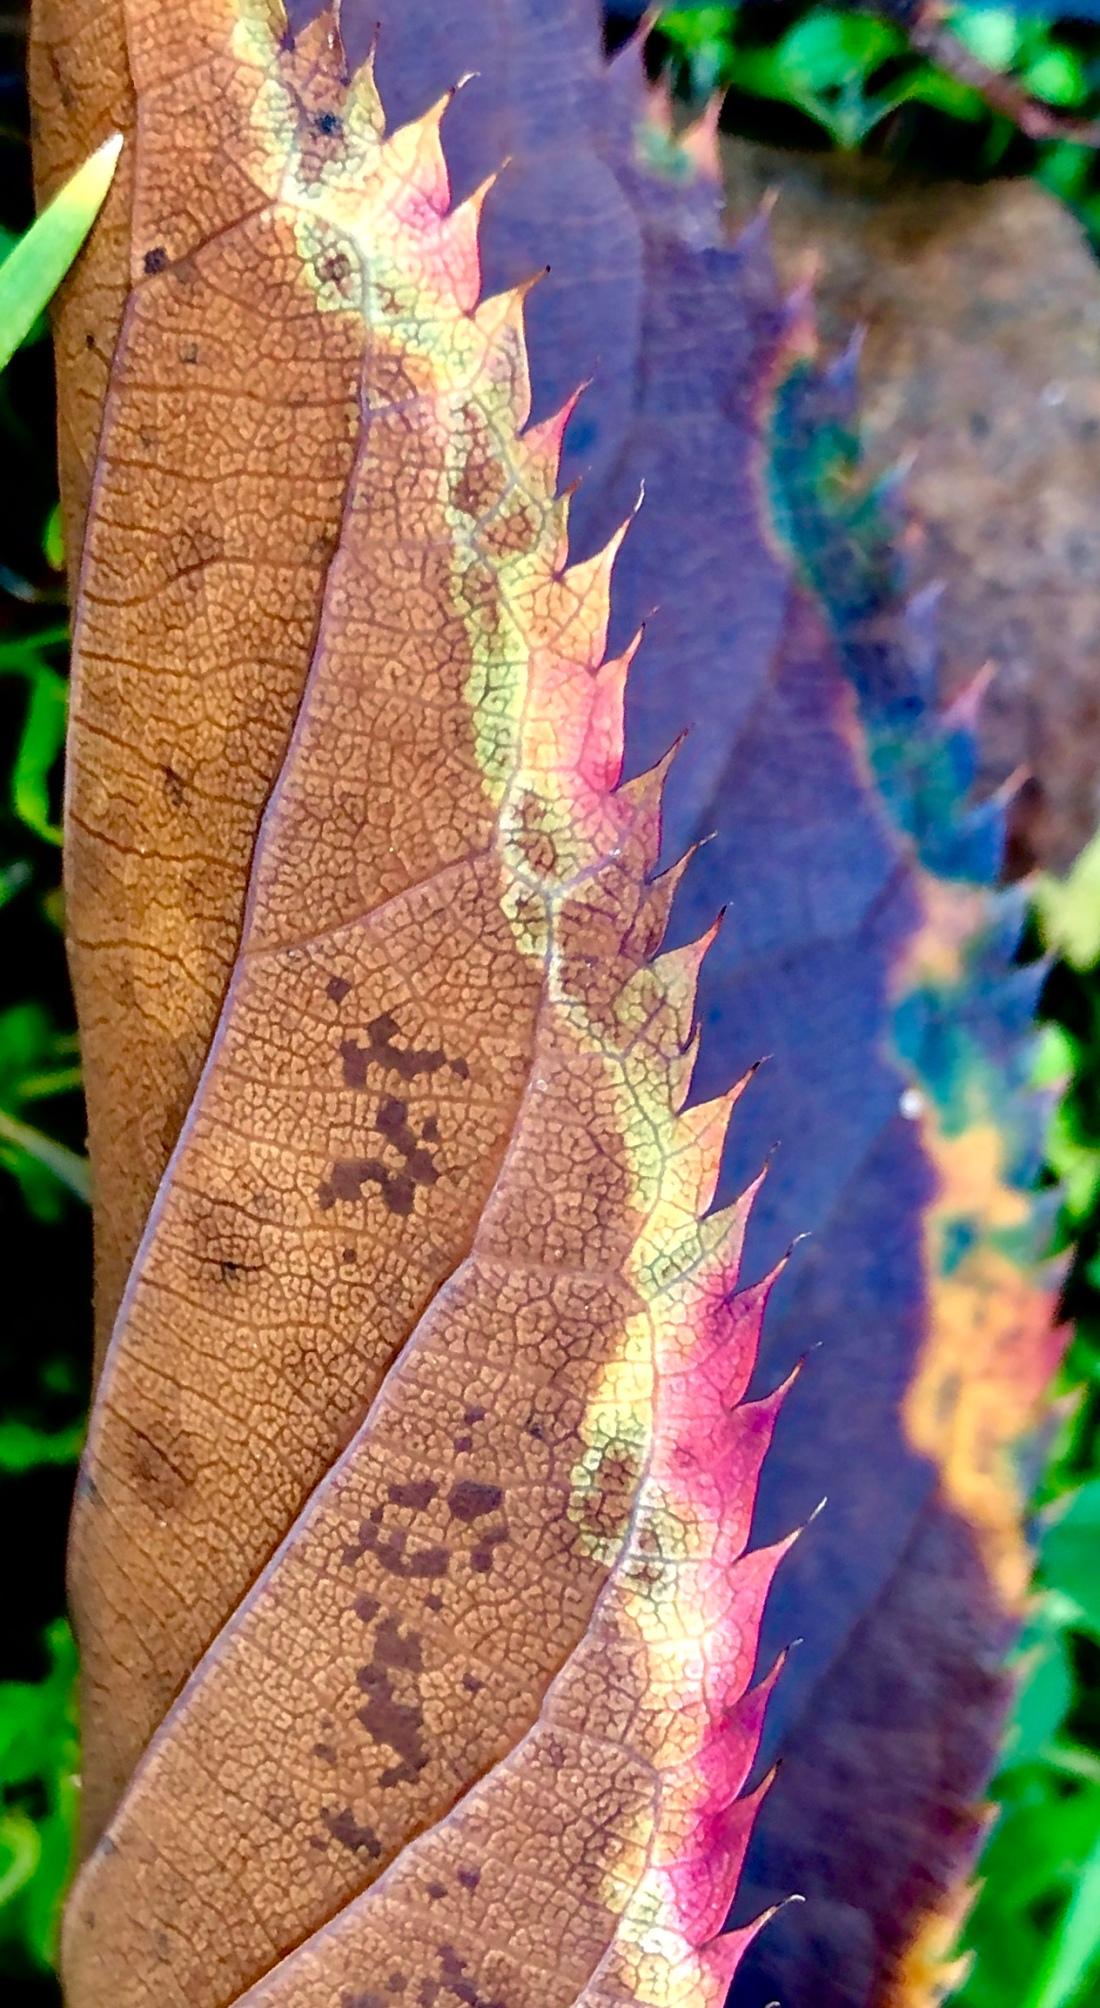 The Leaf Blade